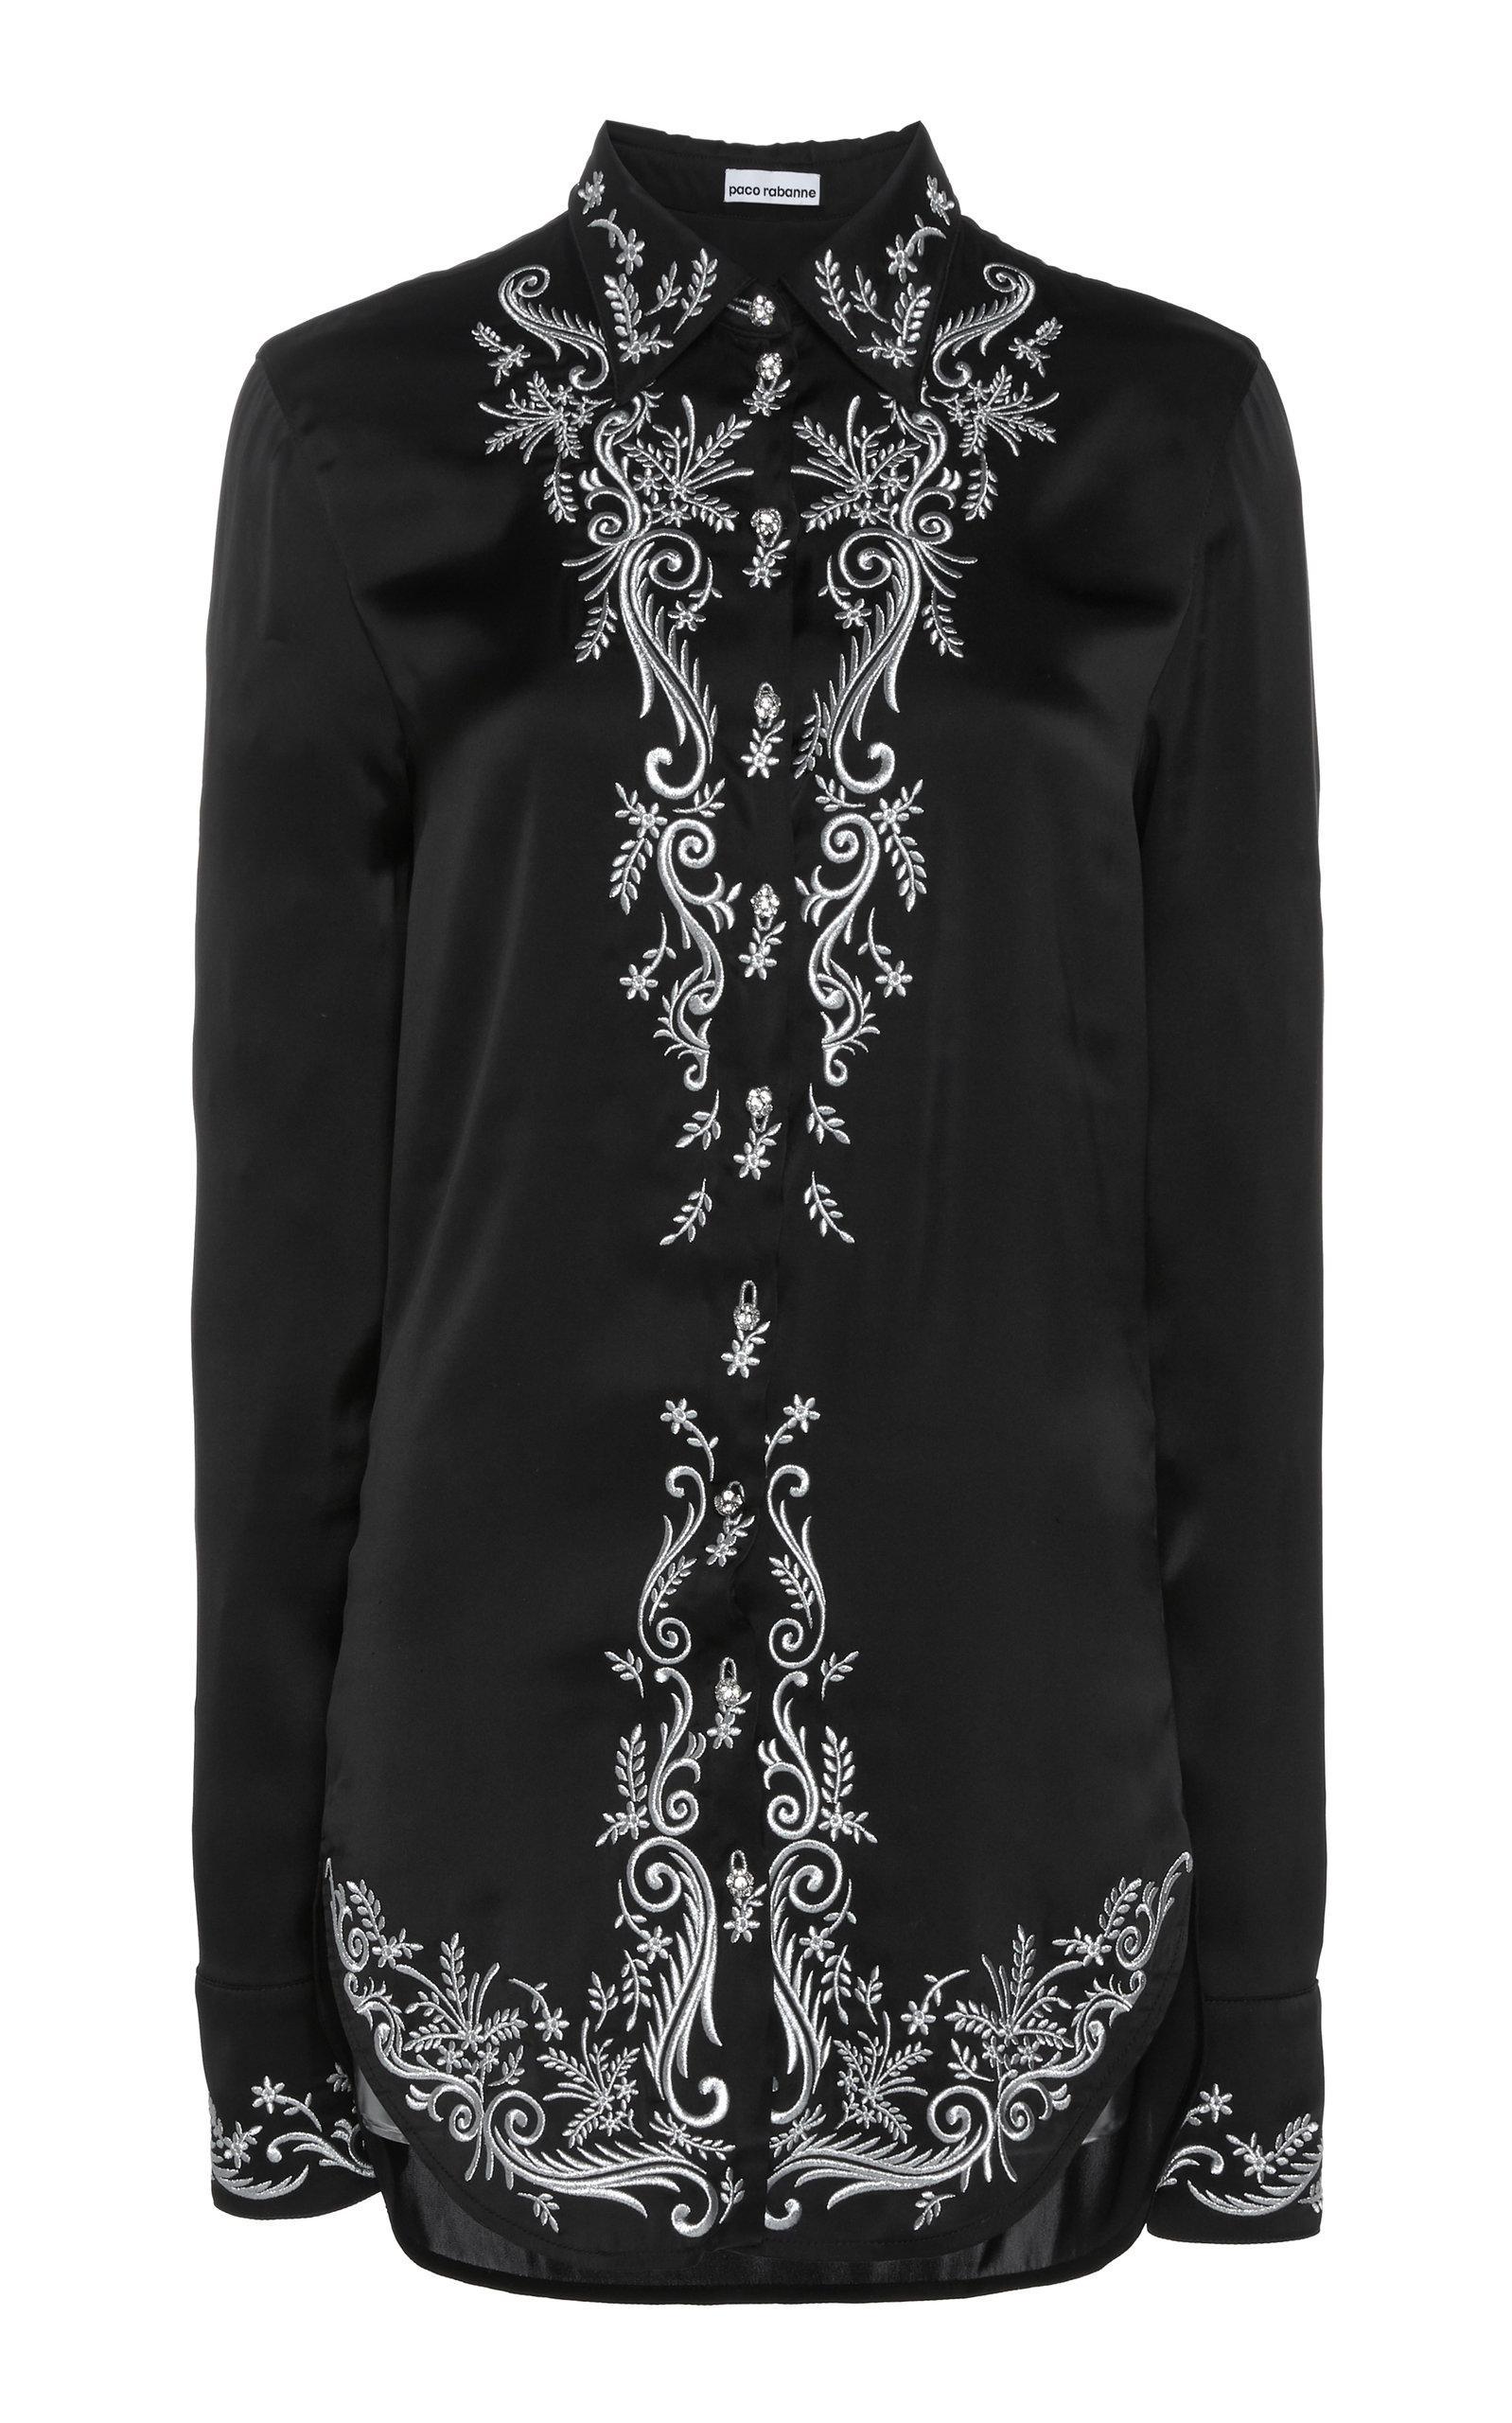 b894c0e7 Paco Rabanne - Black Embroidered Satin Shirt - Lyst. View fullscreen